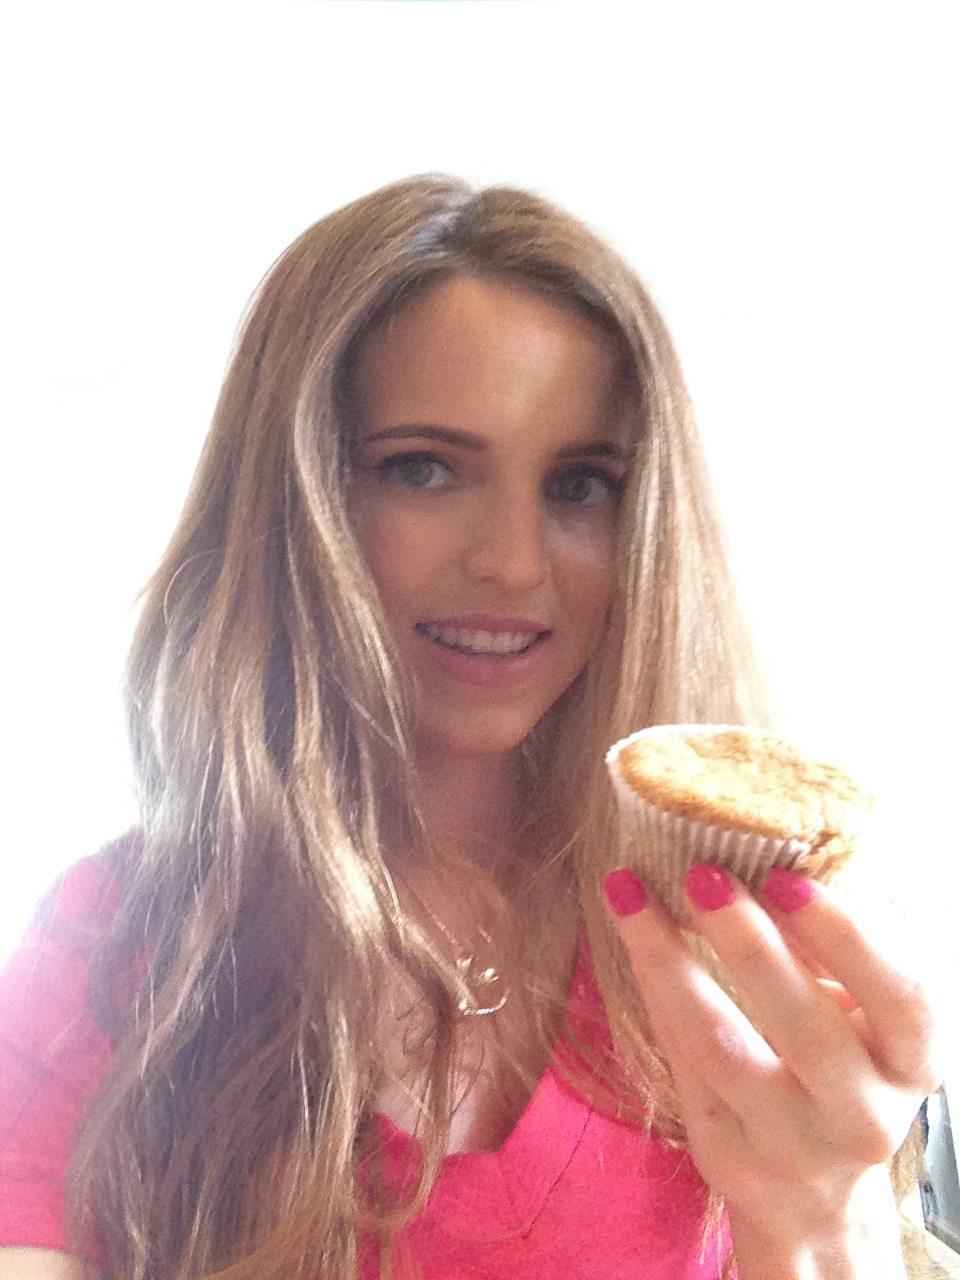 Oatmeal Muffins - Healthy & Whole Grain